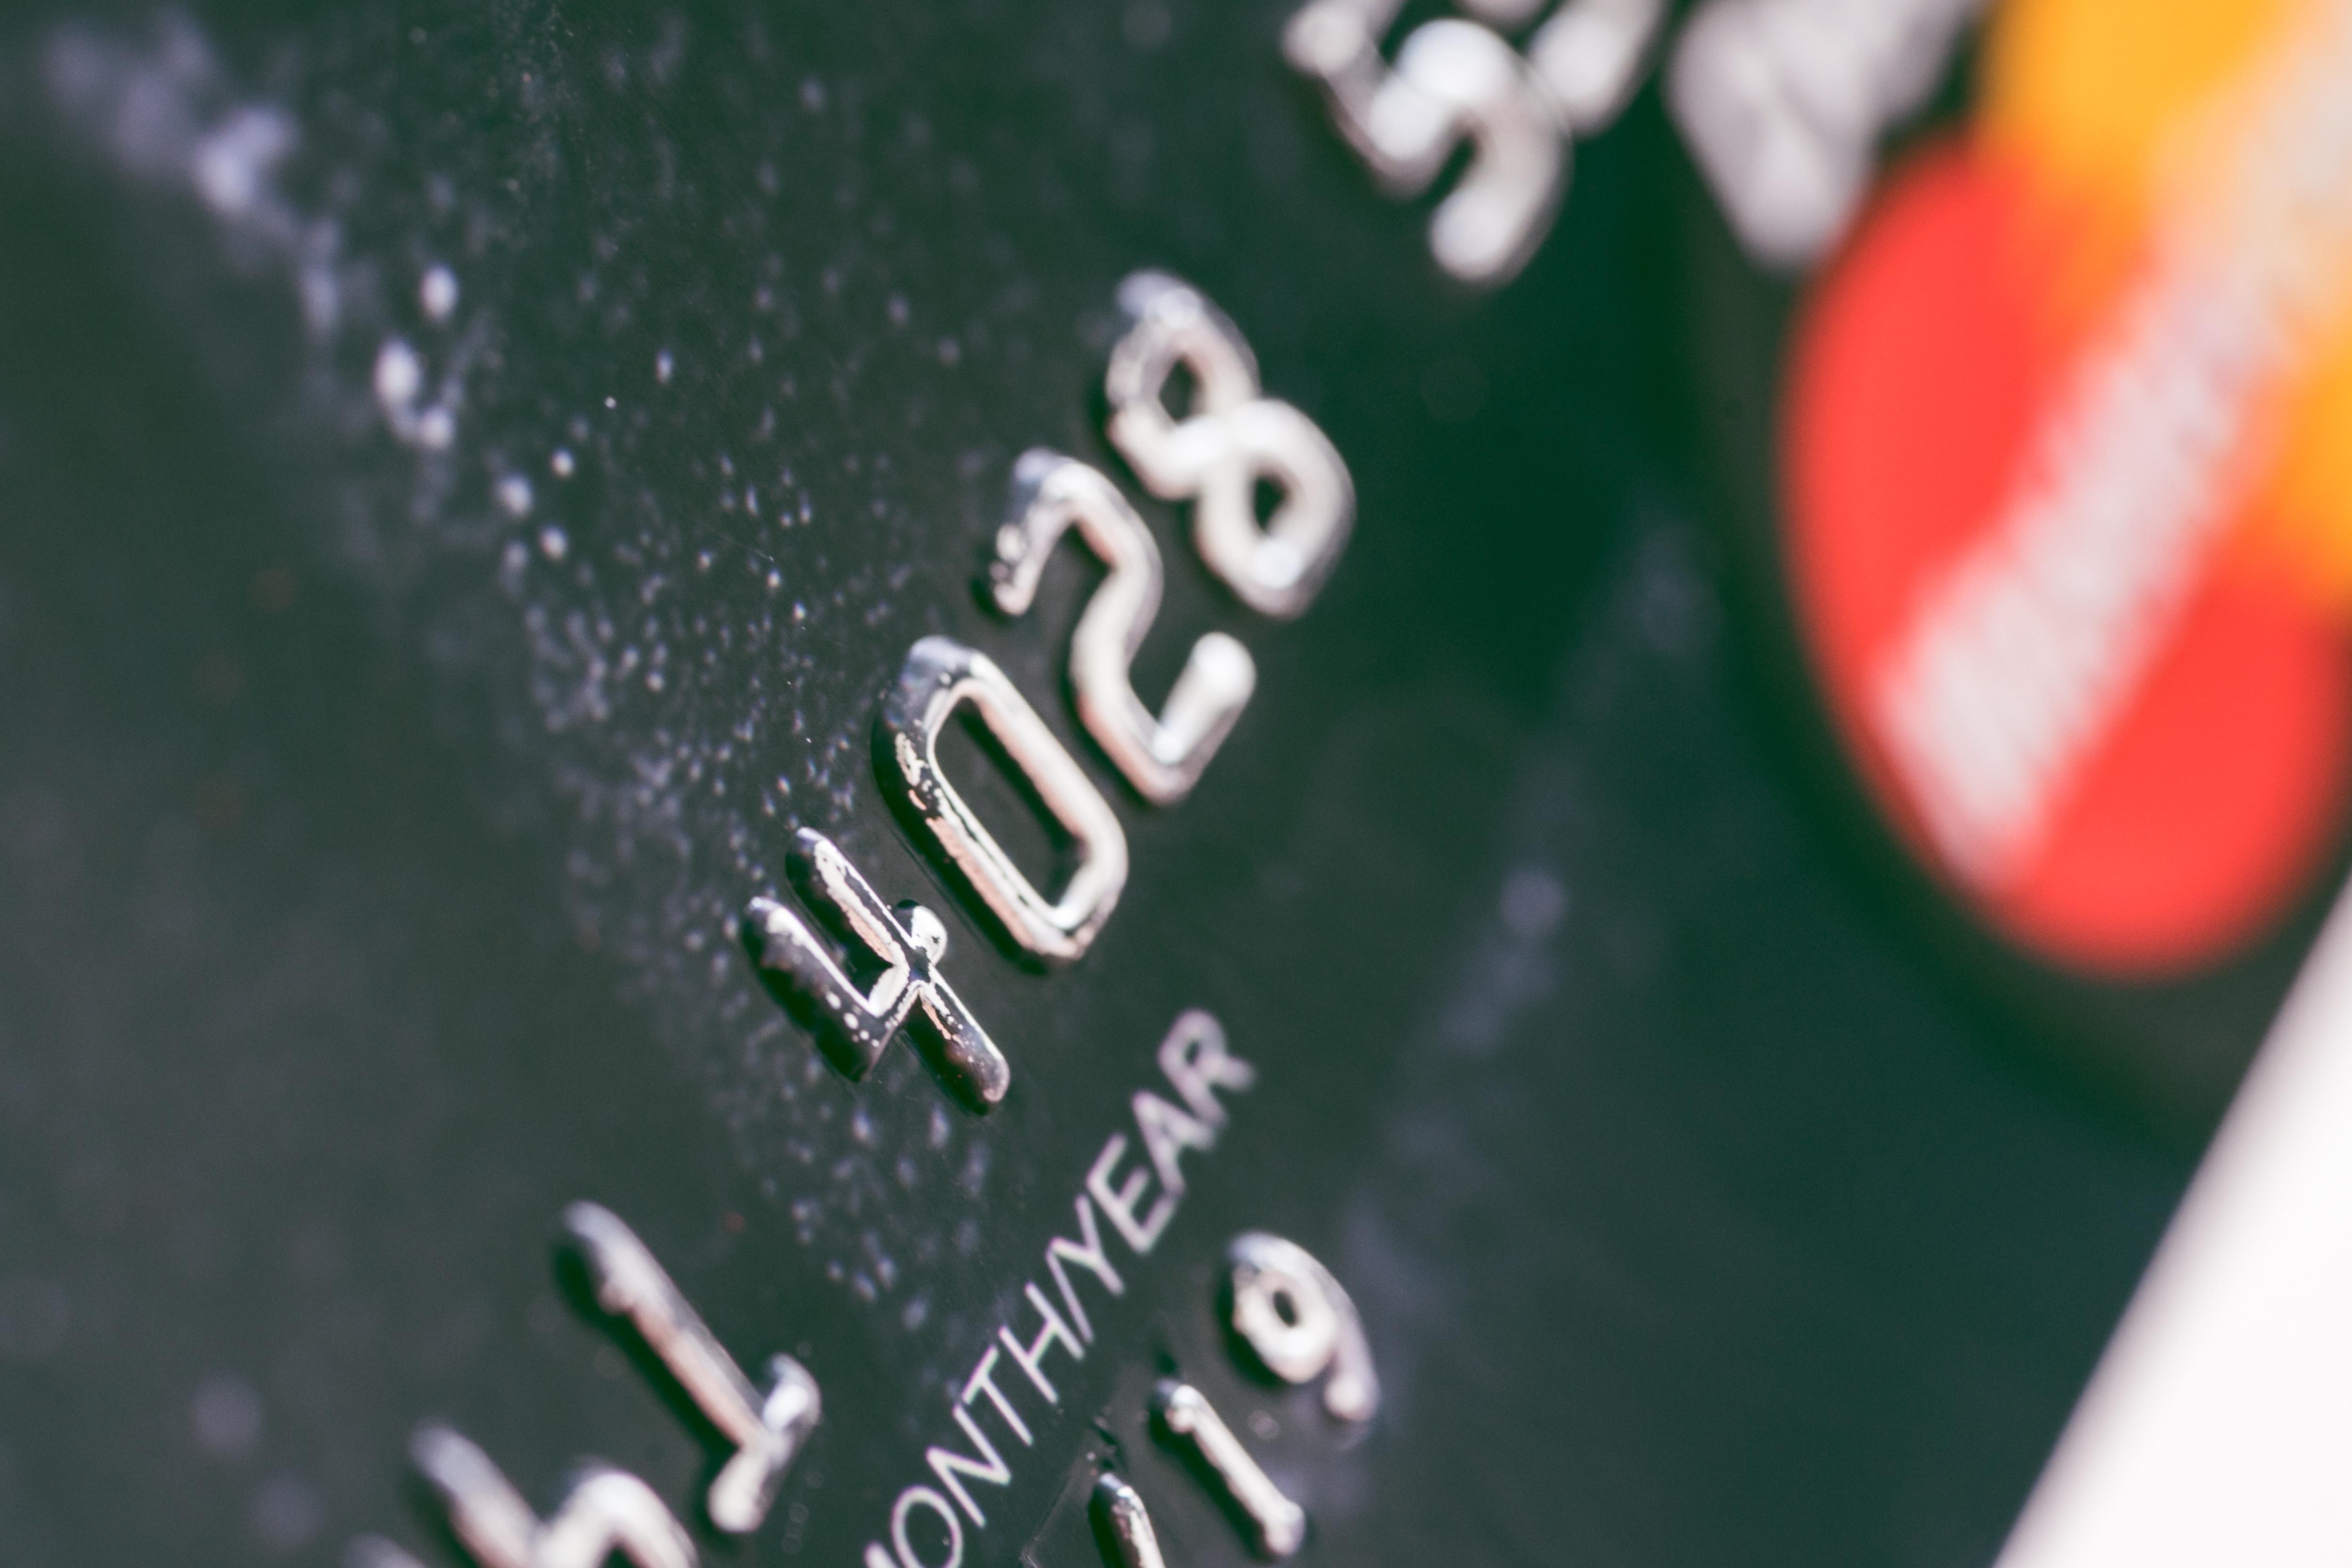 debit-card-bank-numbers-close-up-picjumbo-com (2).jpg